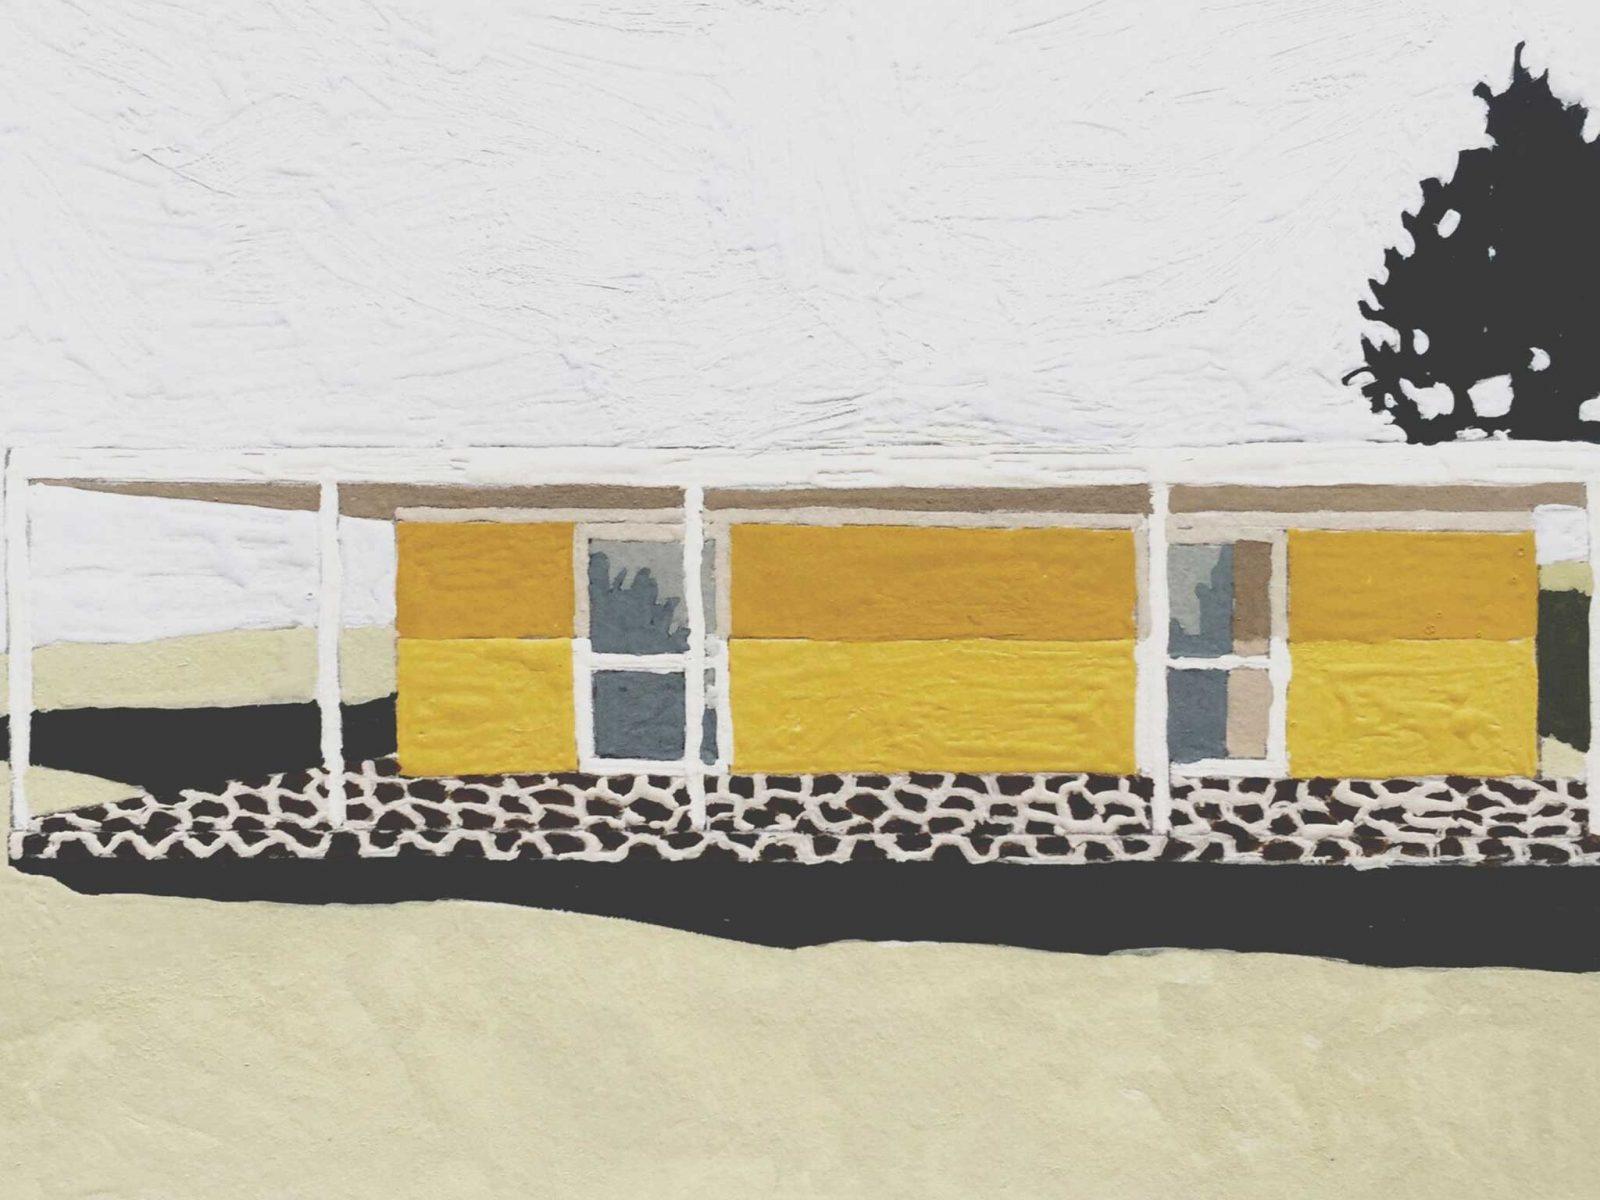 Artwork of yello house